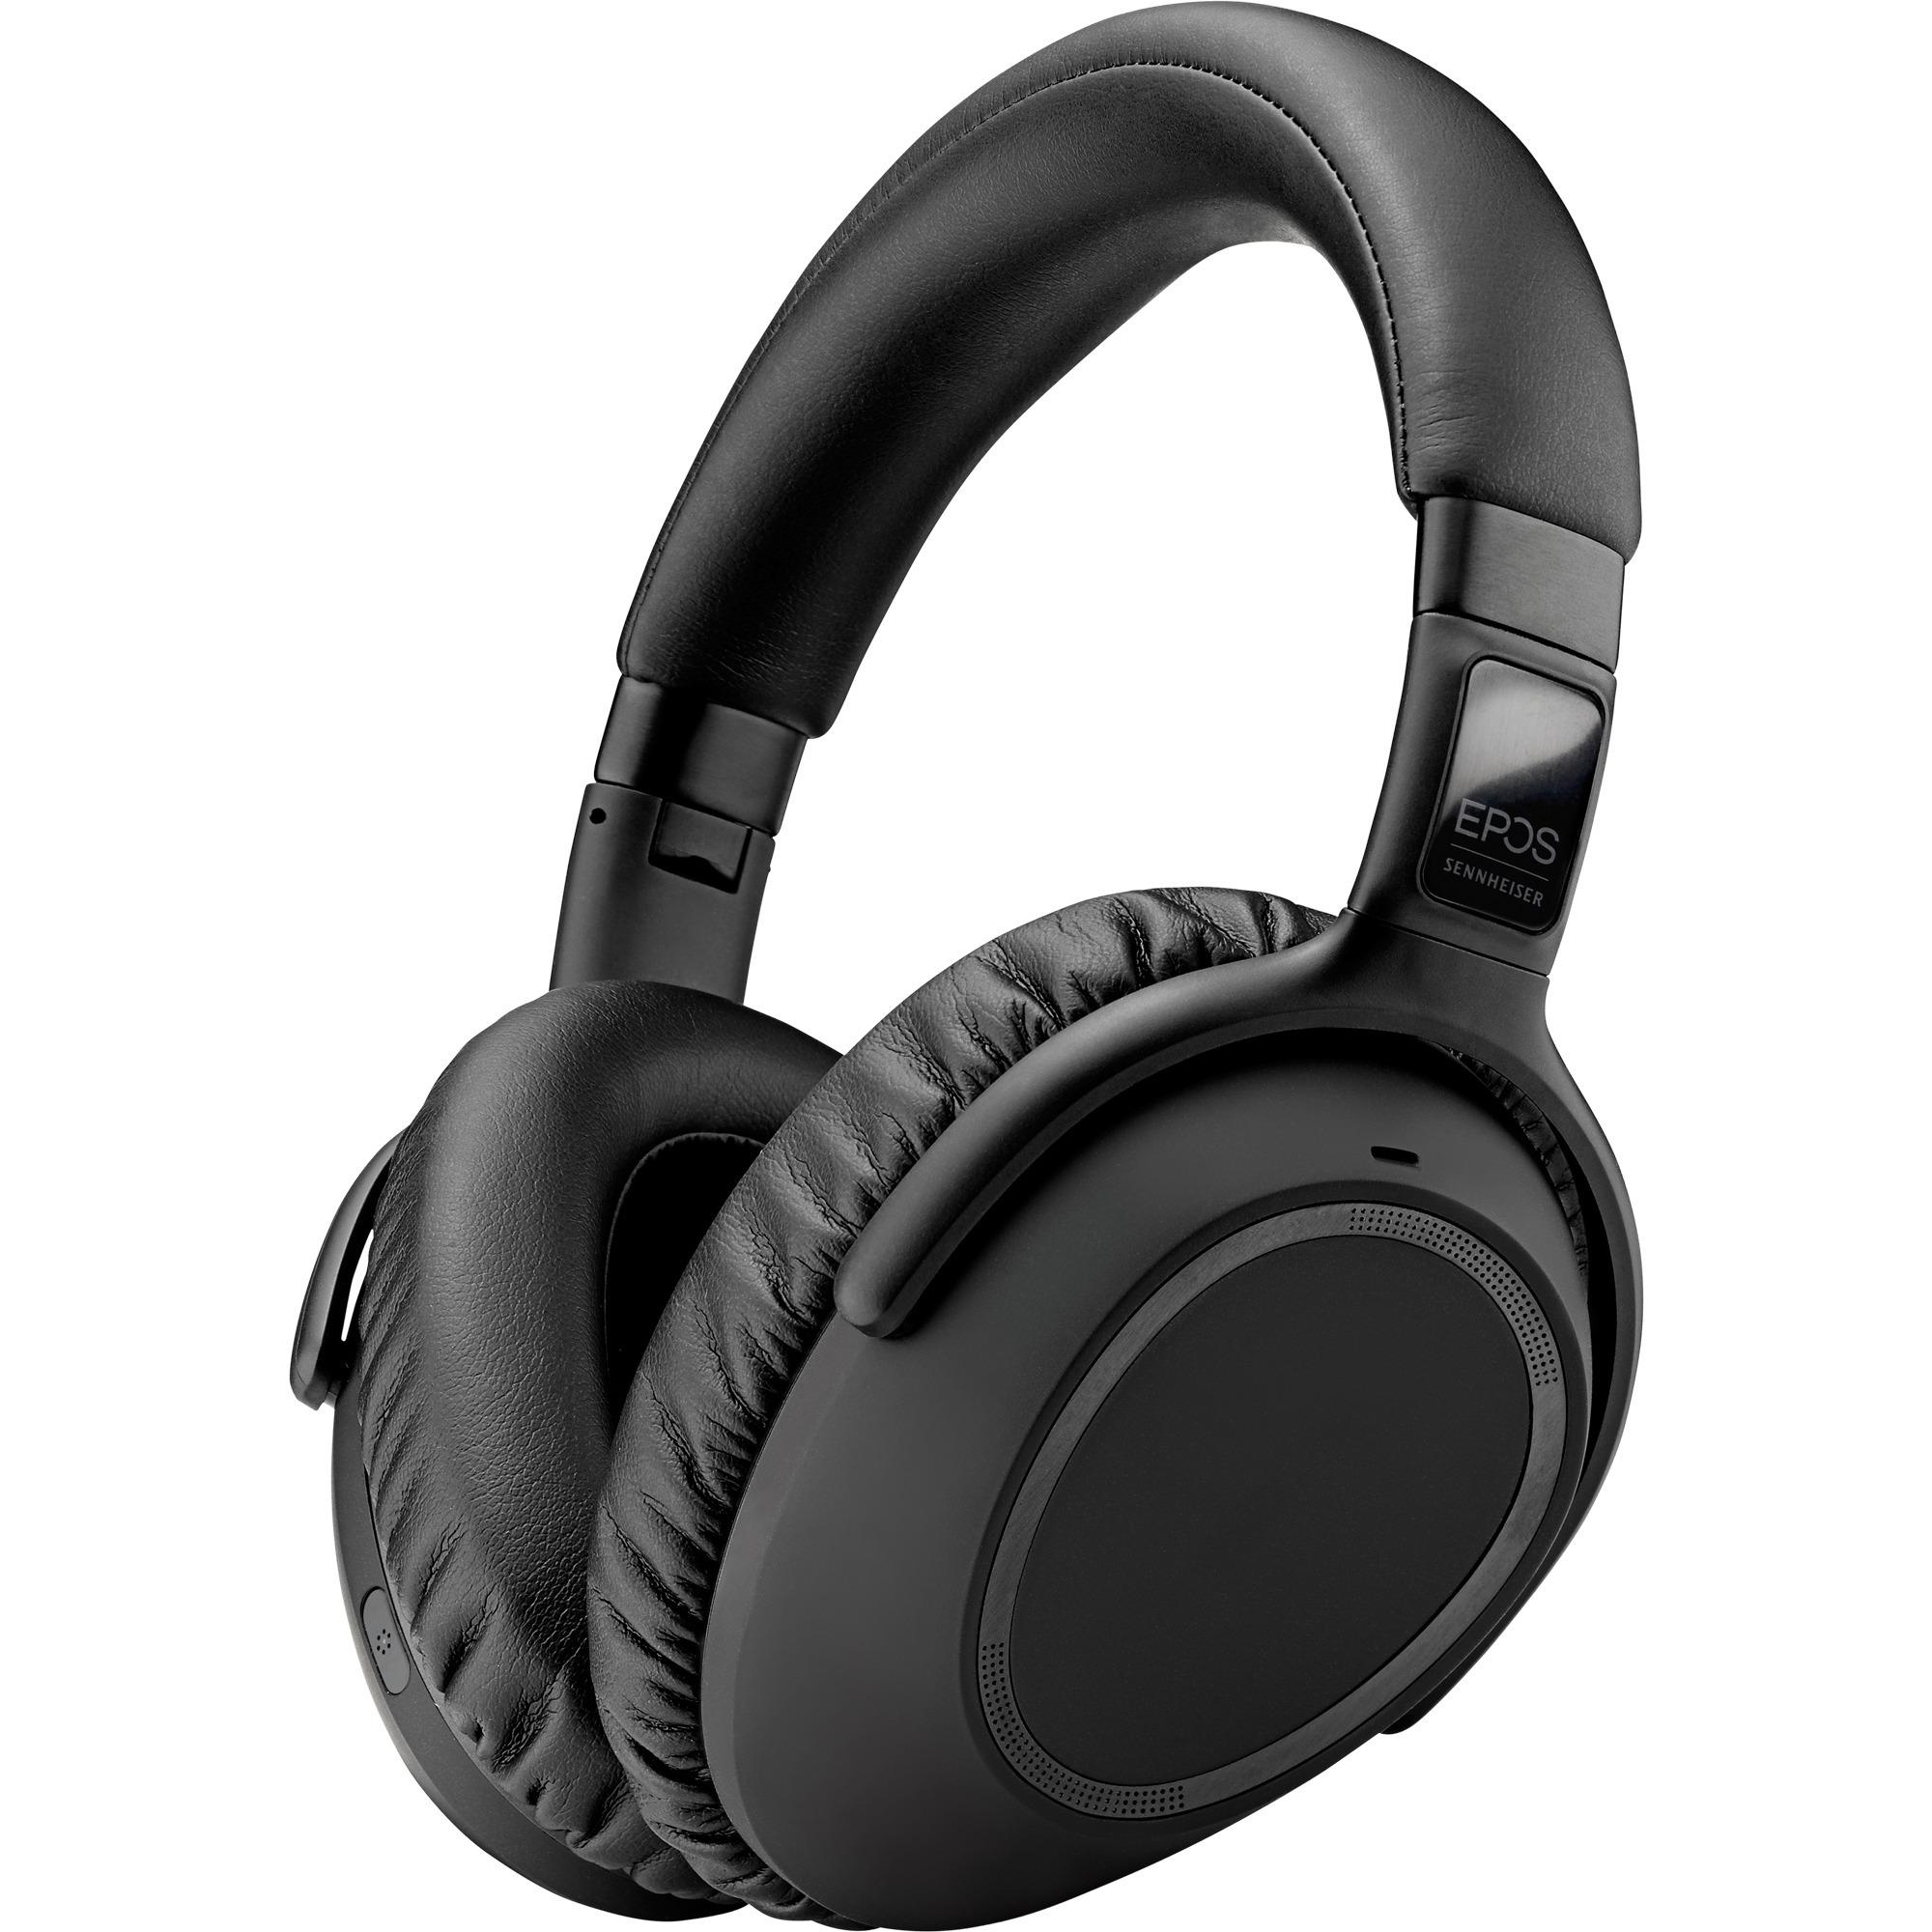 Produktbild: ADAPT 660, Headset